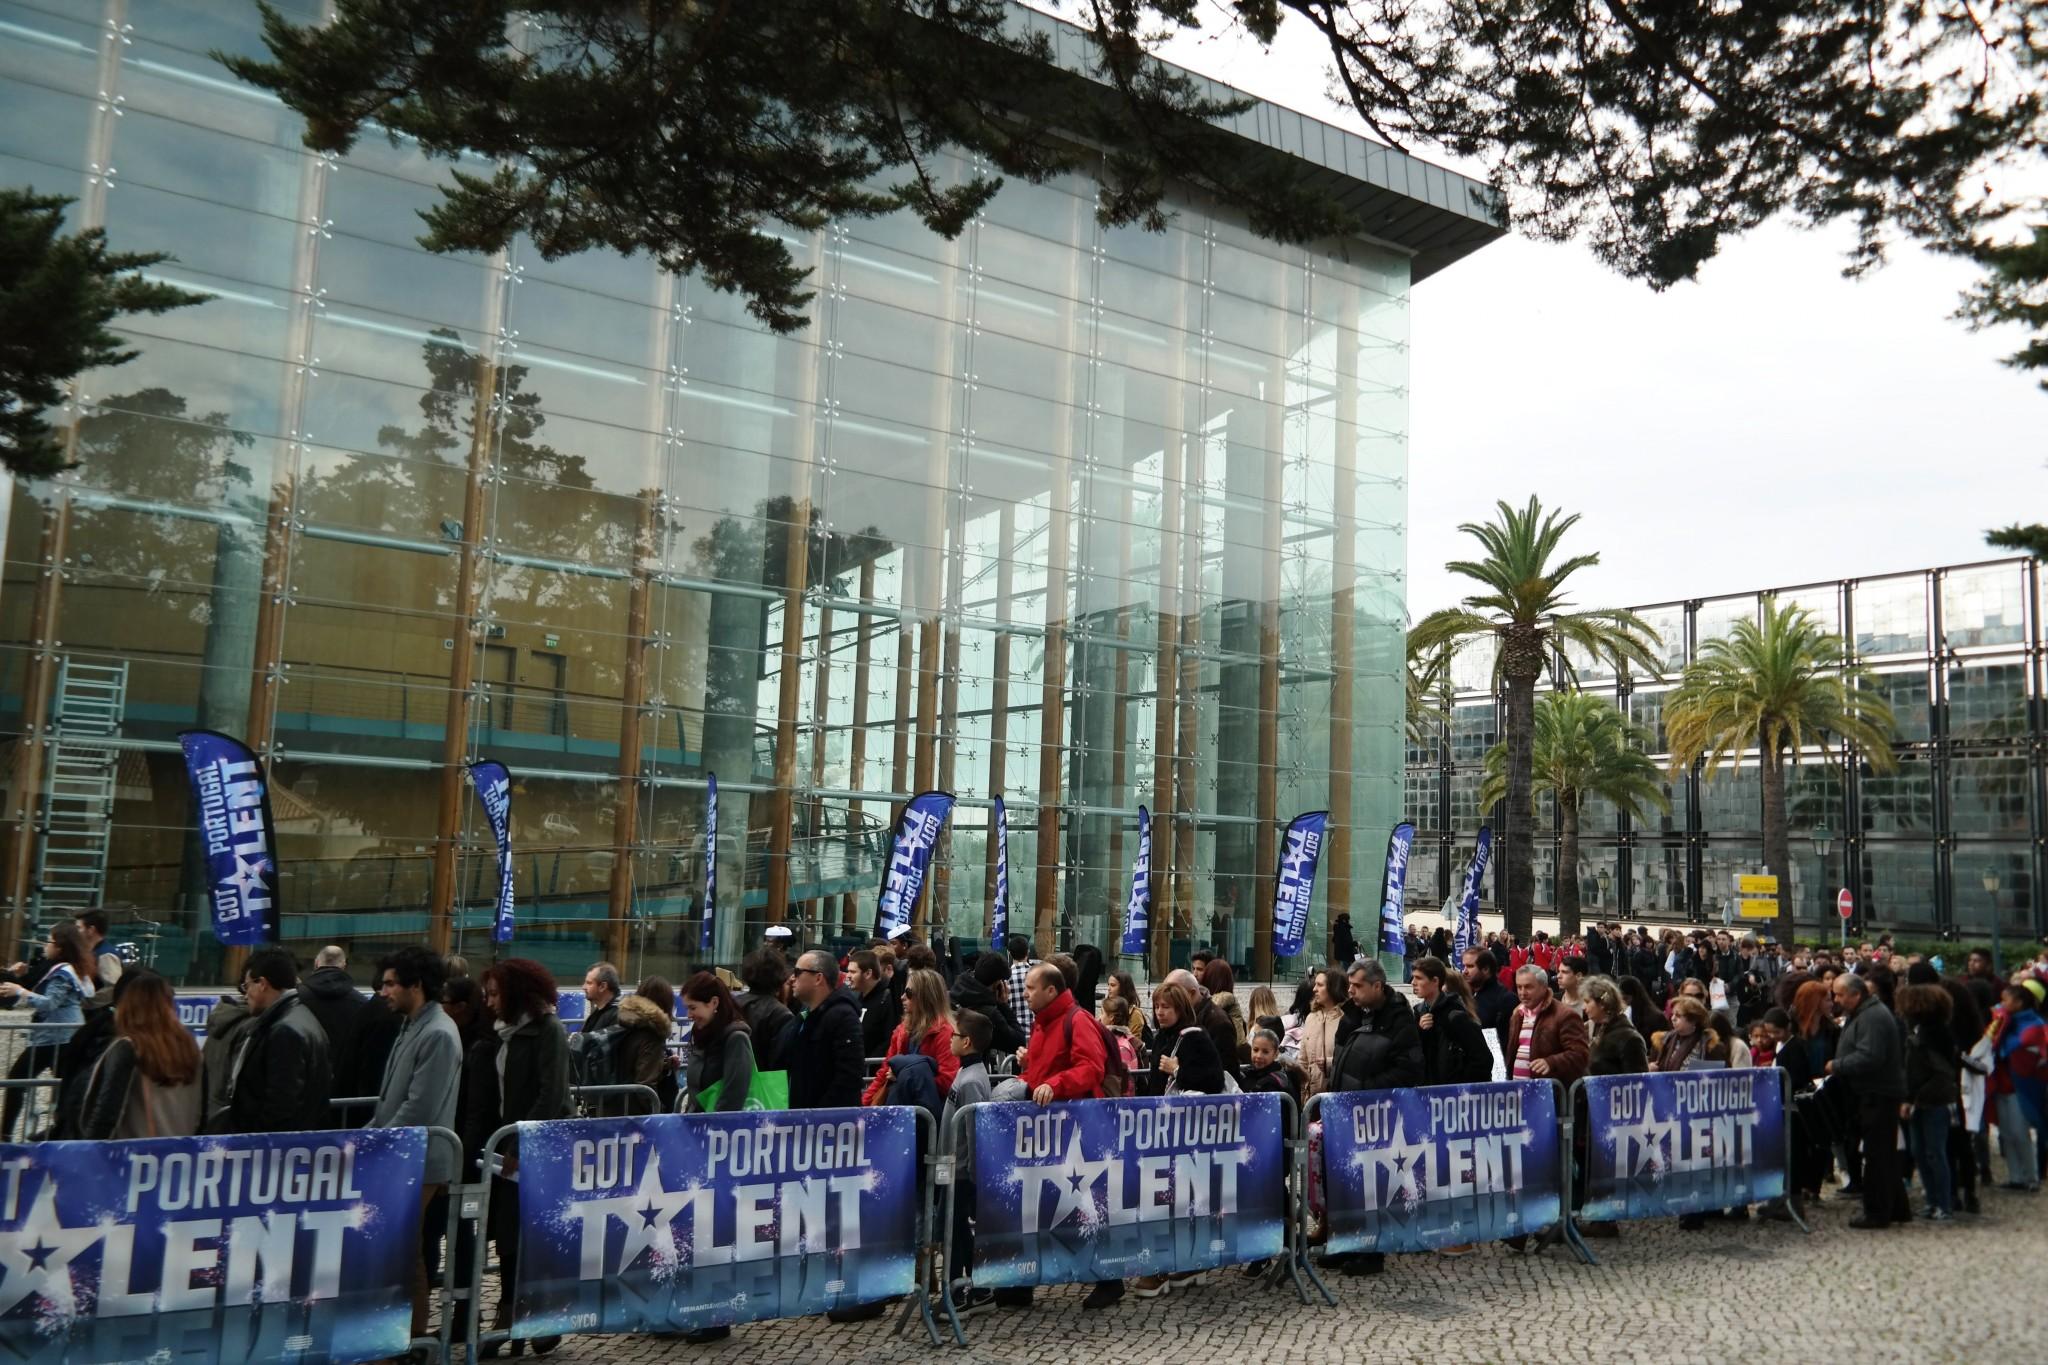 Got Talent Portugal 02 Estoril 012 «Got Talent Portugal»: Estoril Acolhe Mais De 3 Mil Candidatos [Com Fotos]